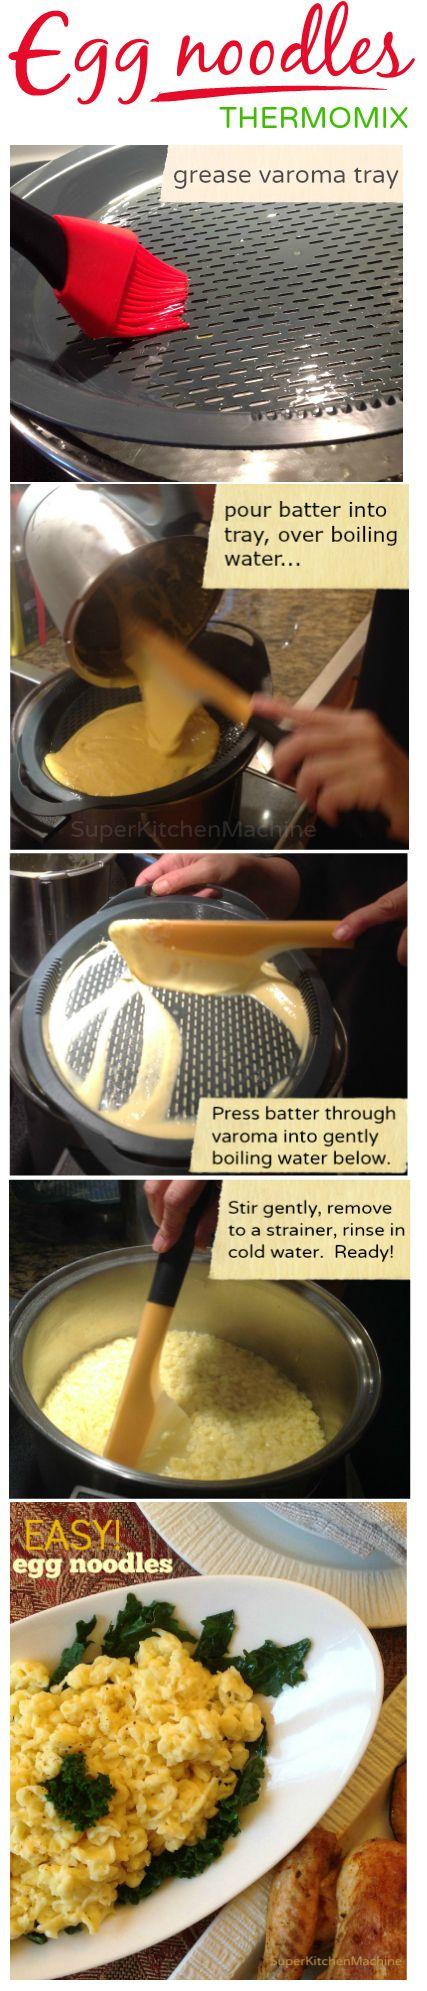 Thermomix noodle recipe method